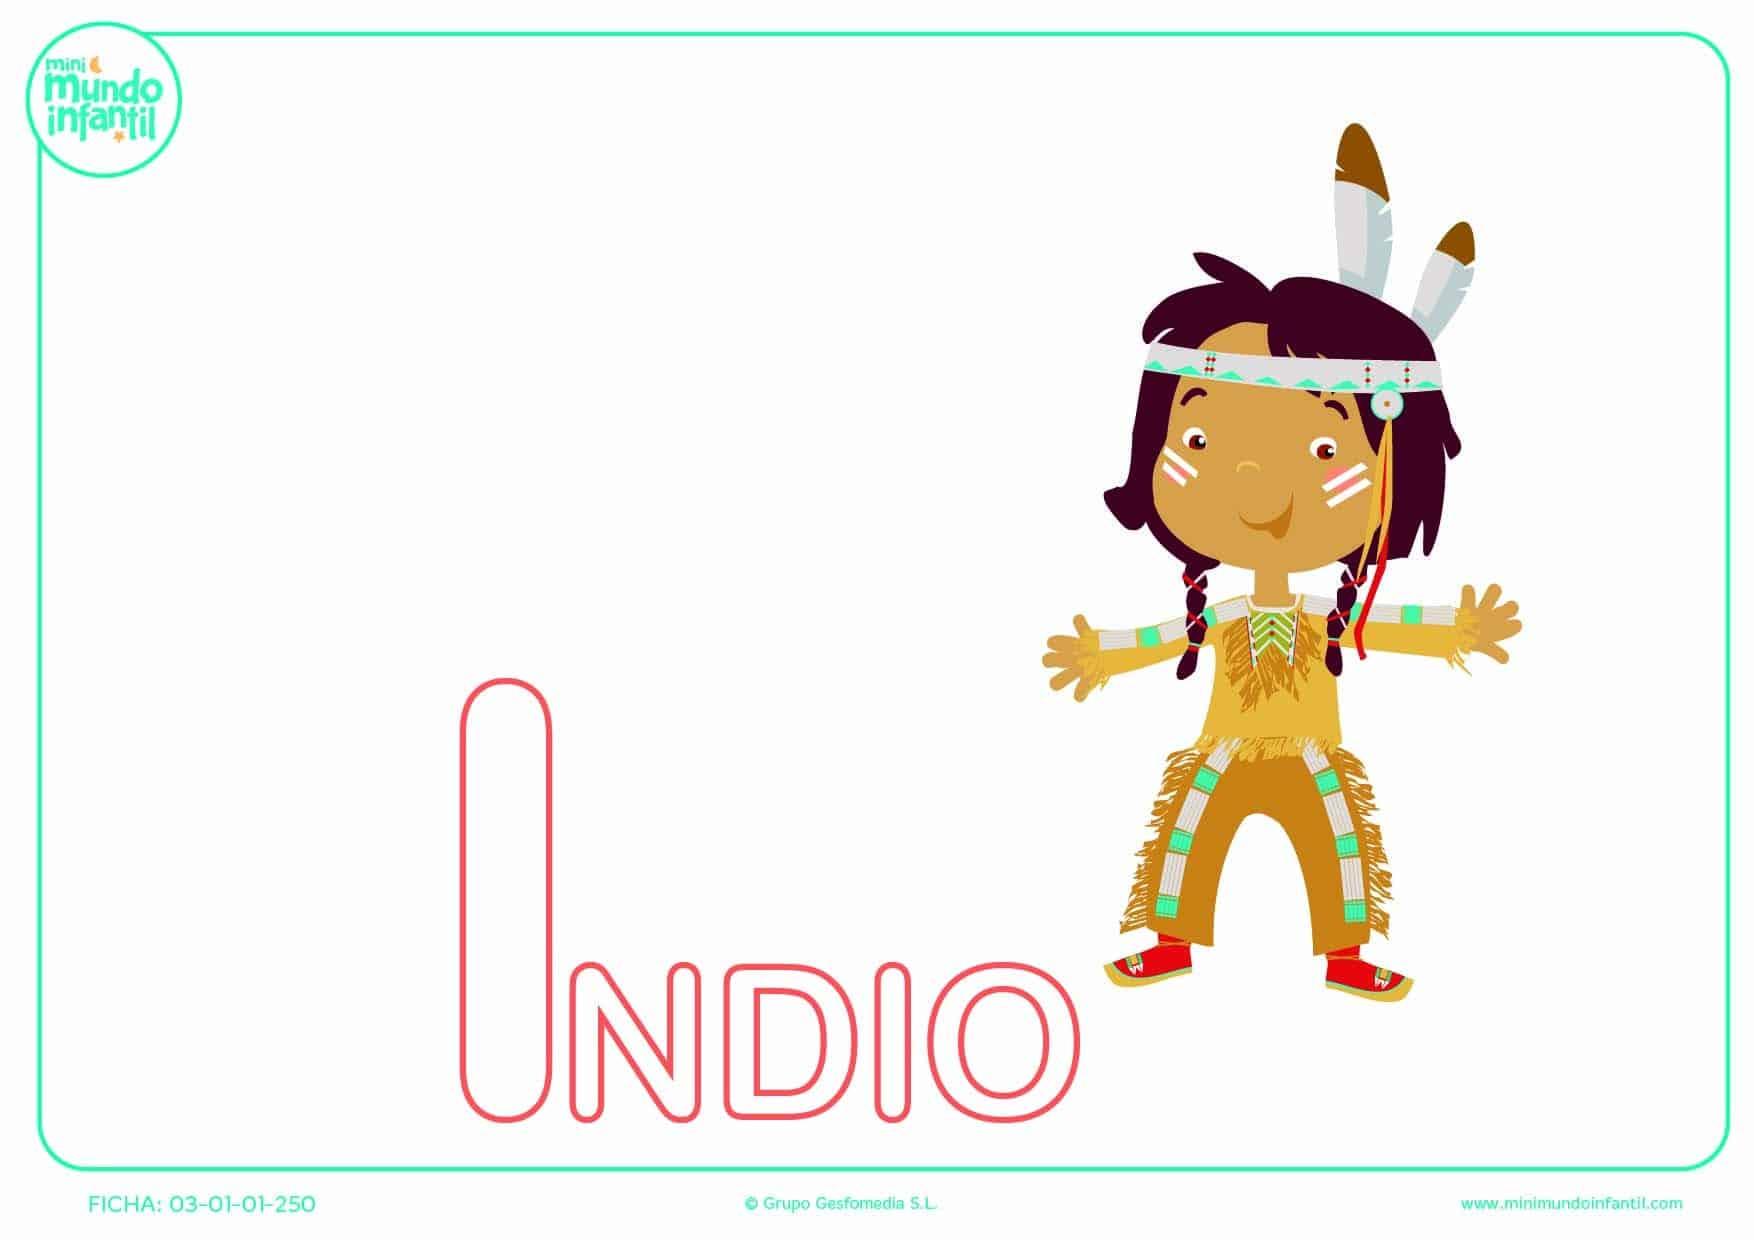 Completar la letra I mayúscula de indio